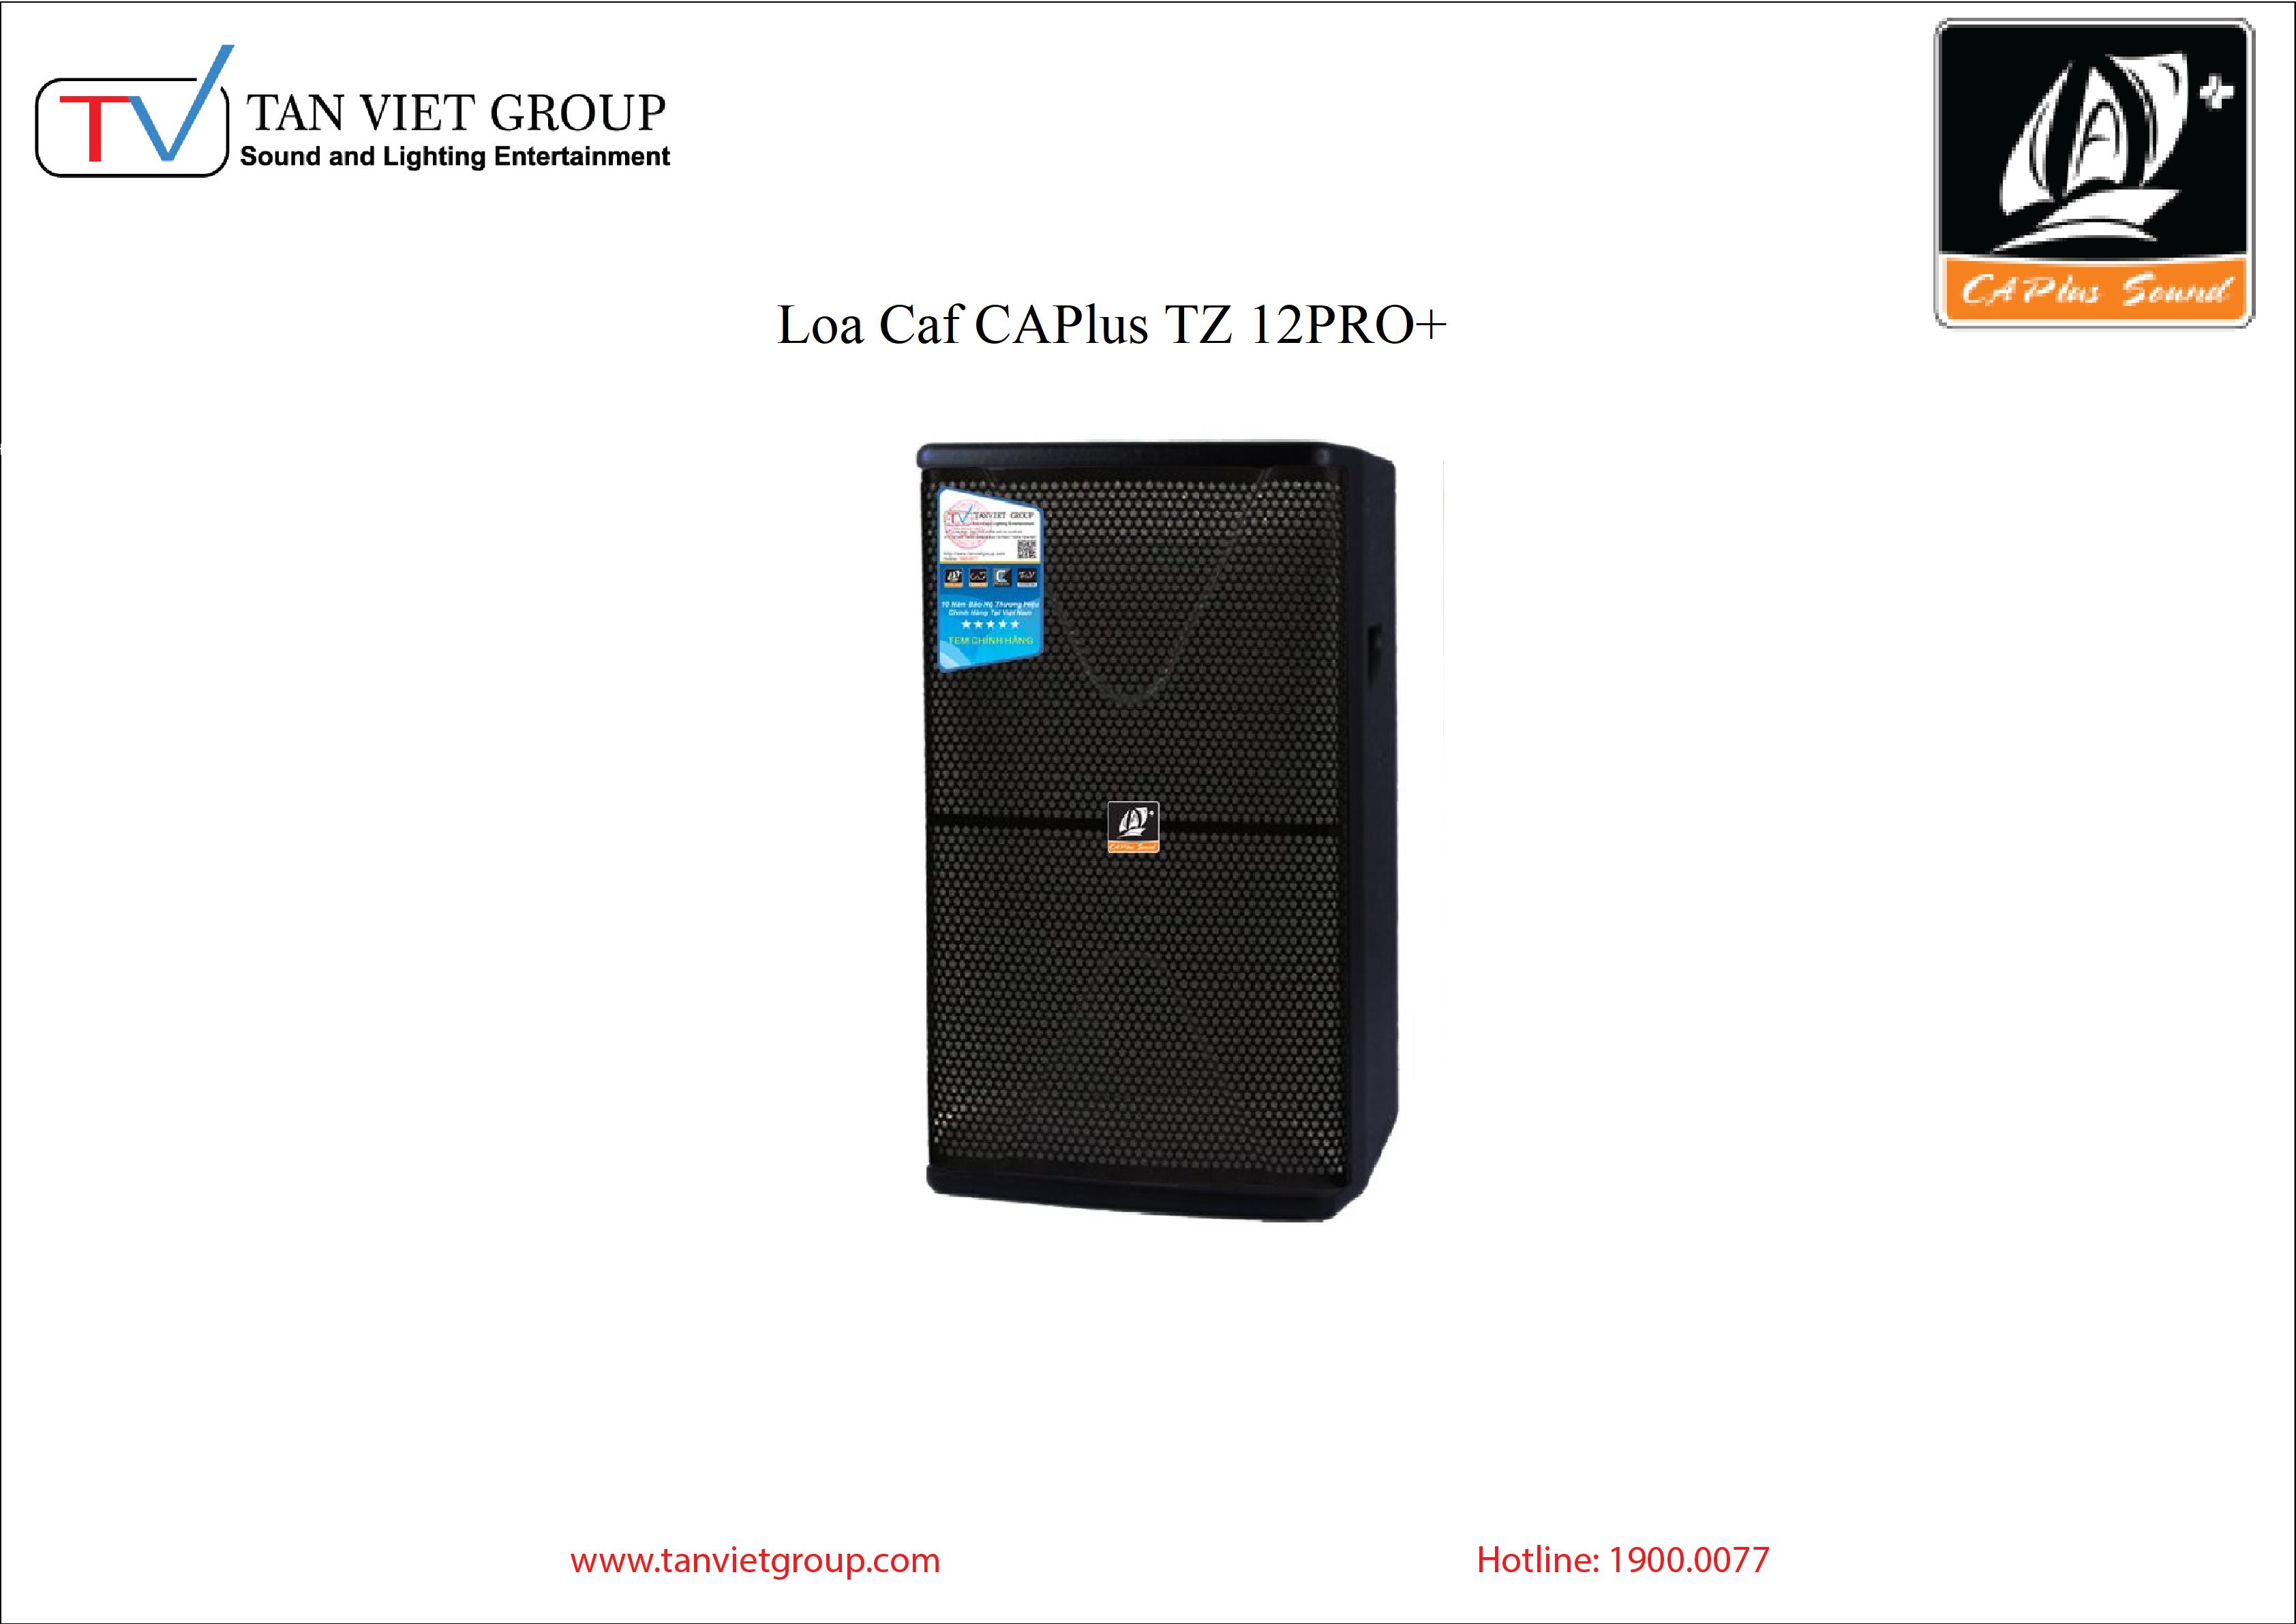 Loa Caf CAPlus TZ 12PRO+